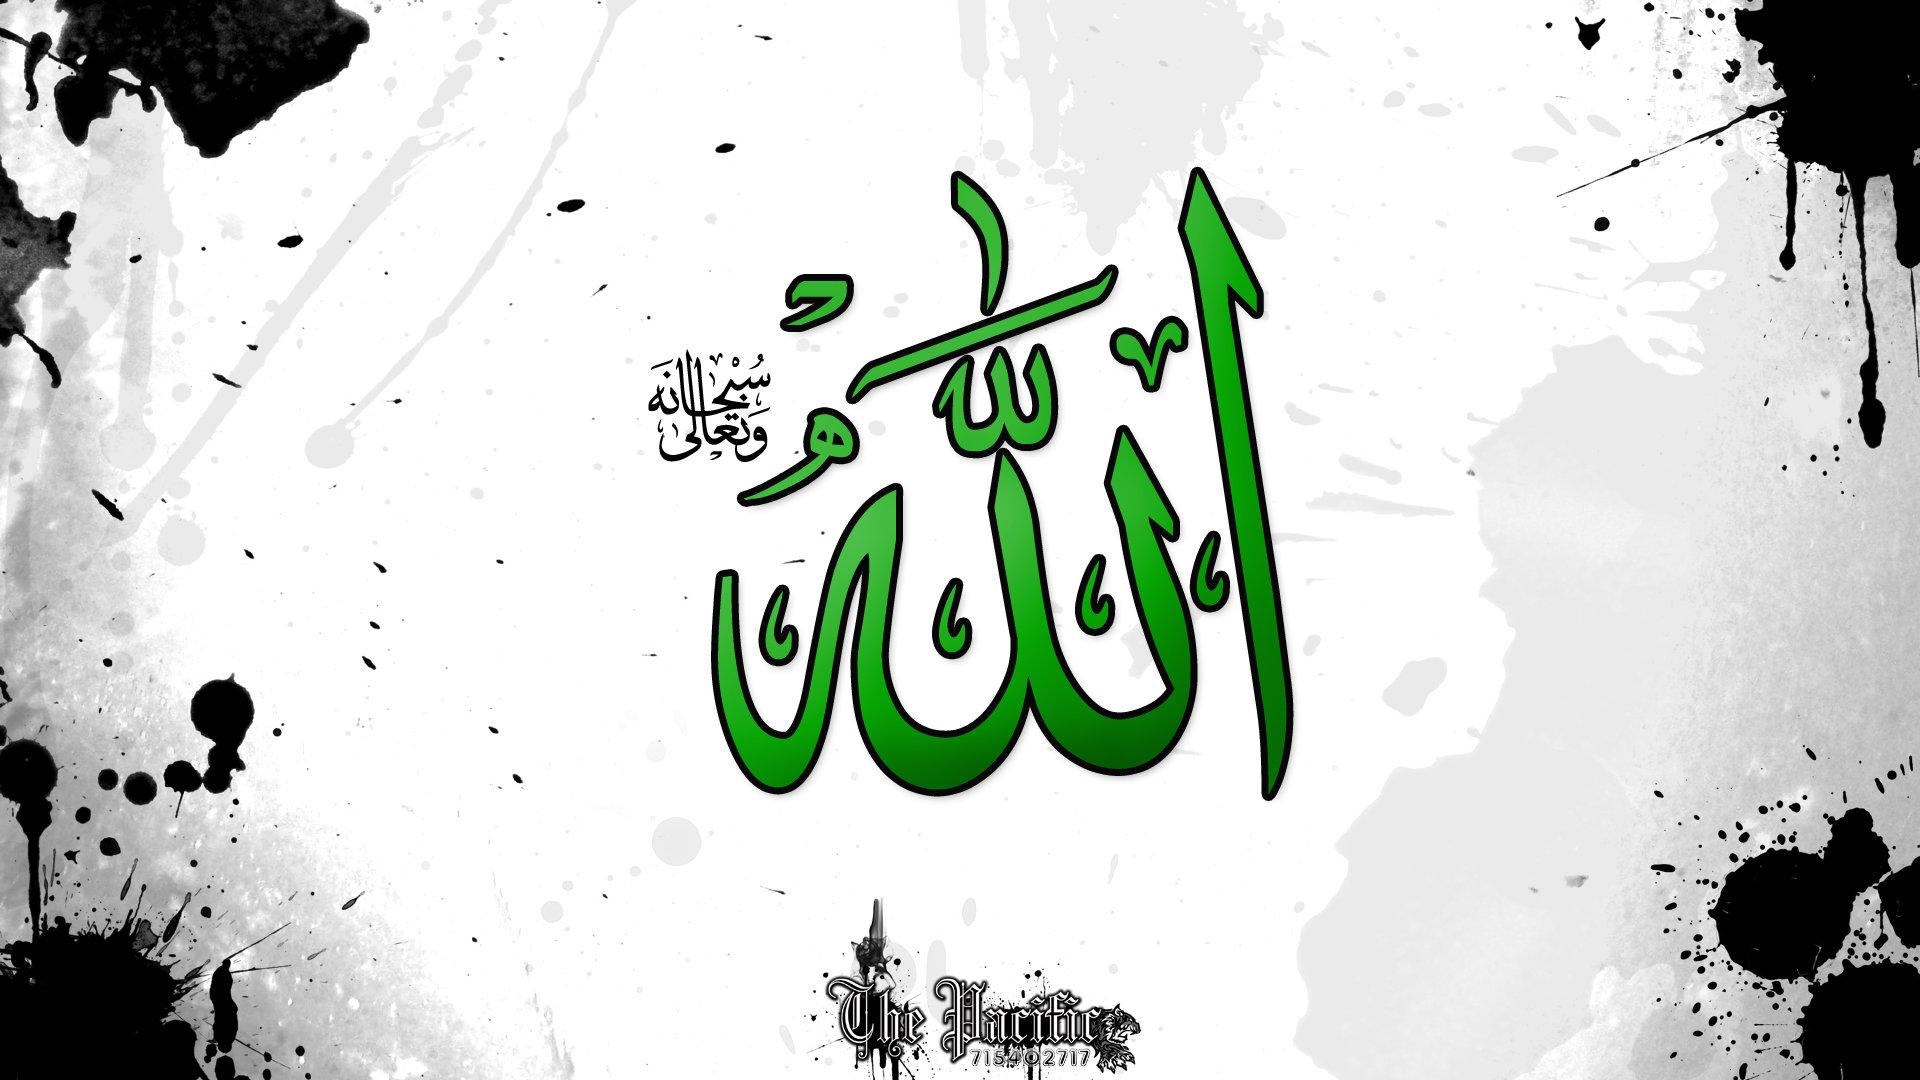 Islam Wallpapers 1920x1080 Full Hd 1080p Desktop Backgrounds